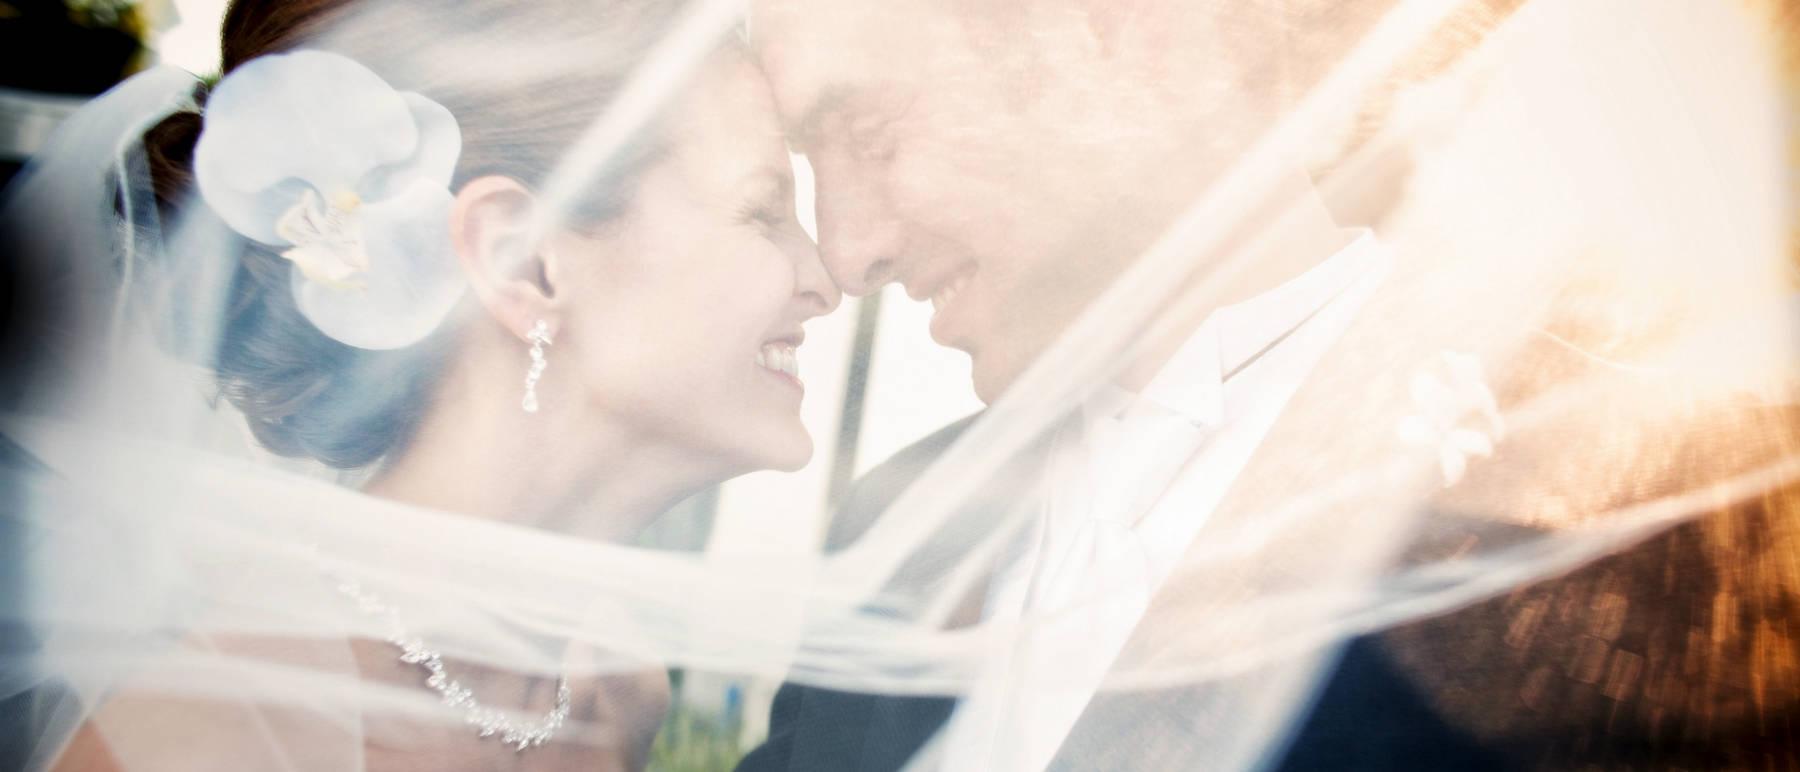 johnandjoseph-wedding-photographer-hz-slider-366